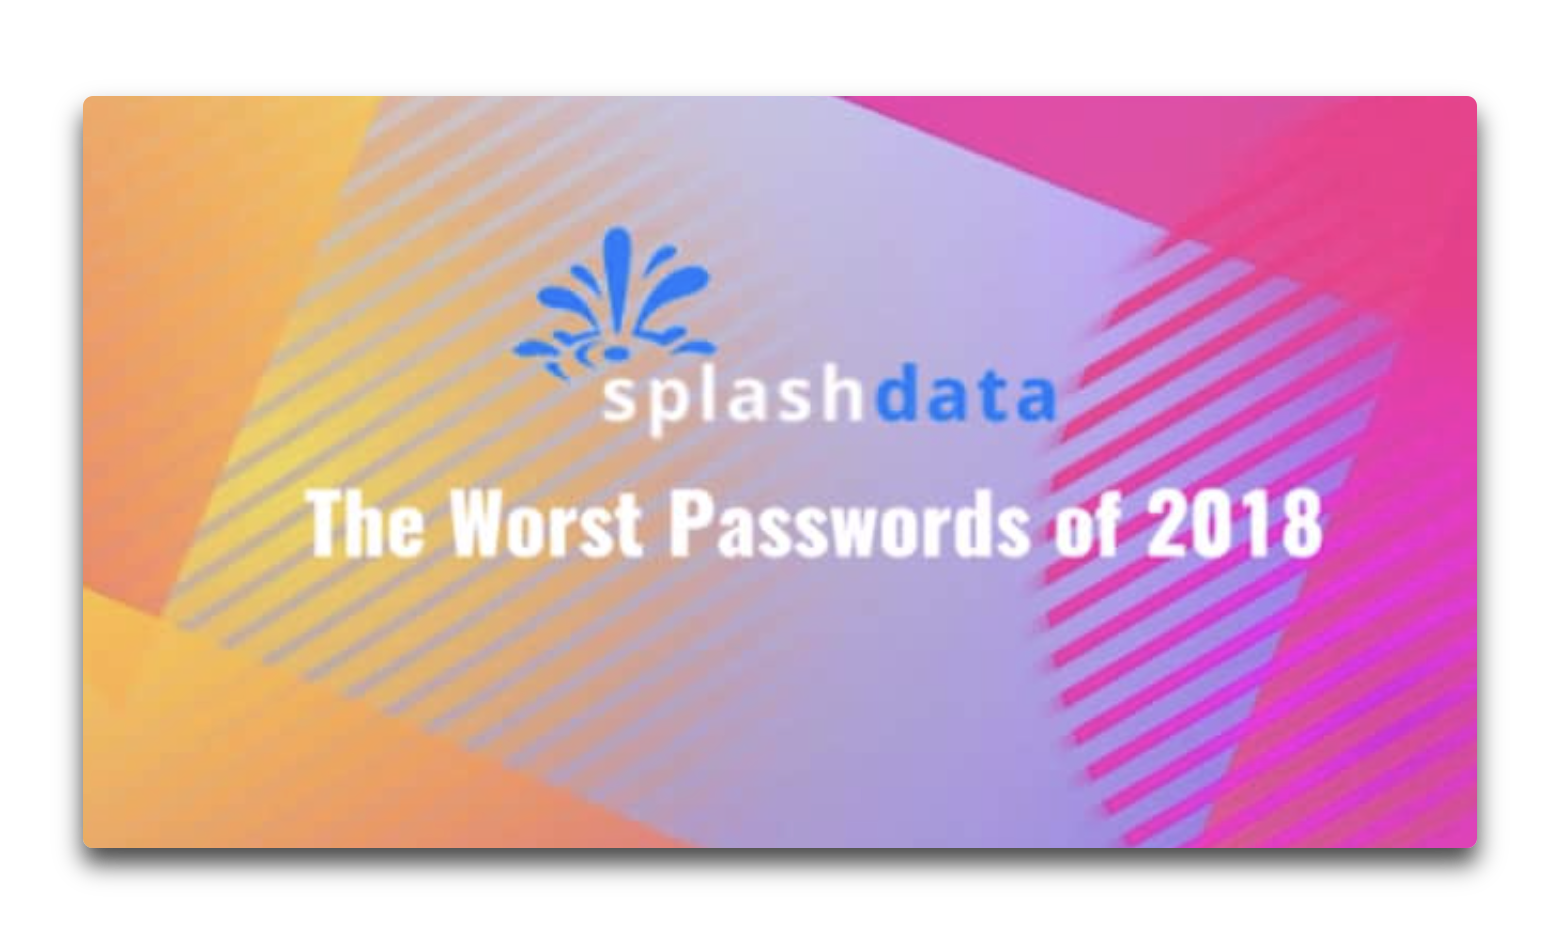 SplashData、2018年最悪のパスワードTop 100を発表、トップは5年連続